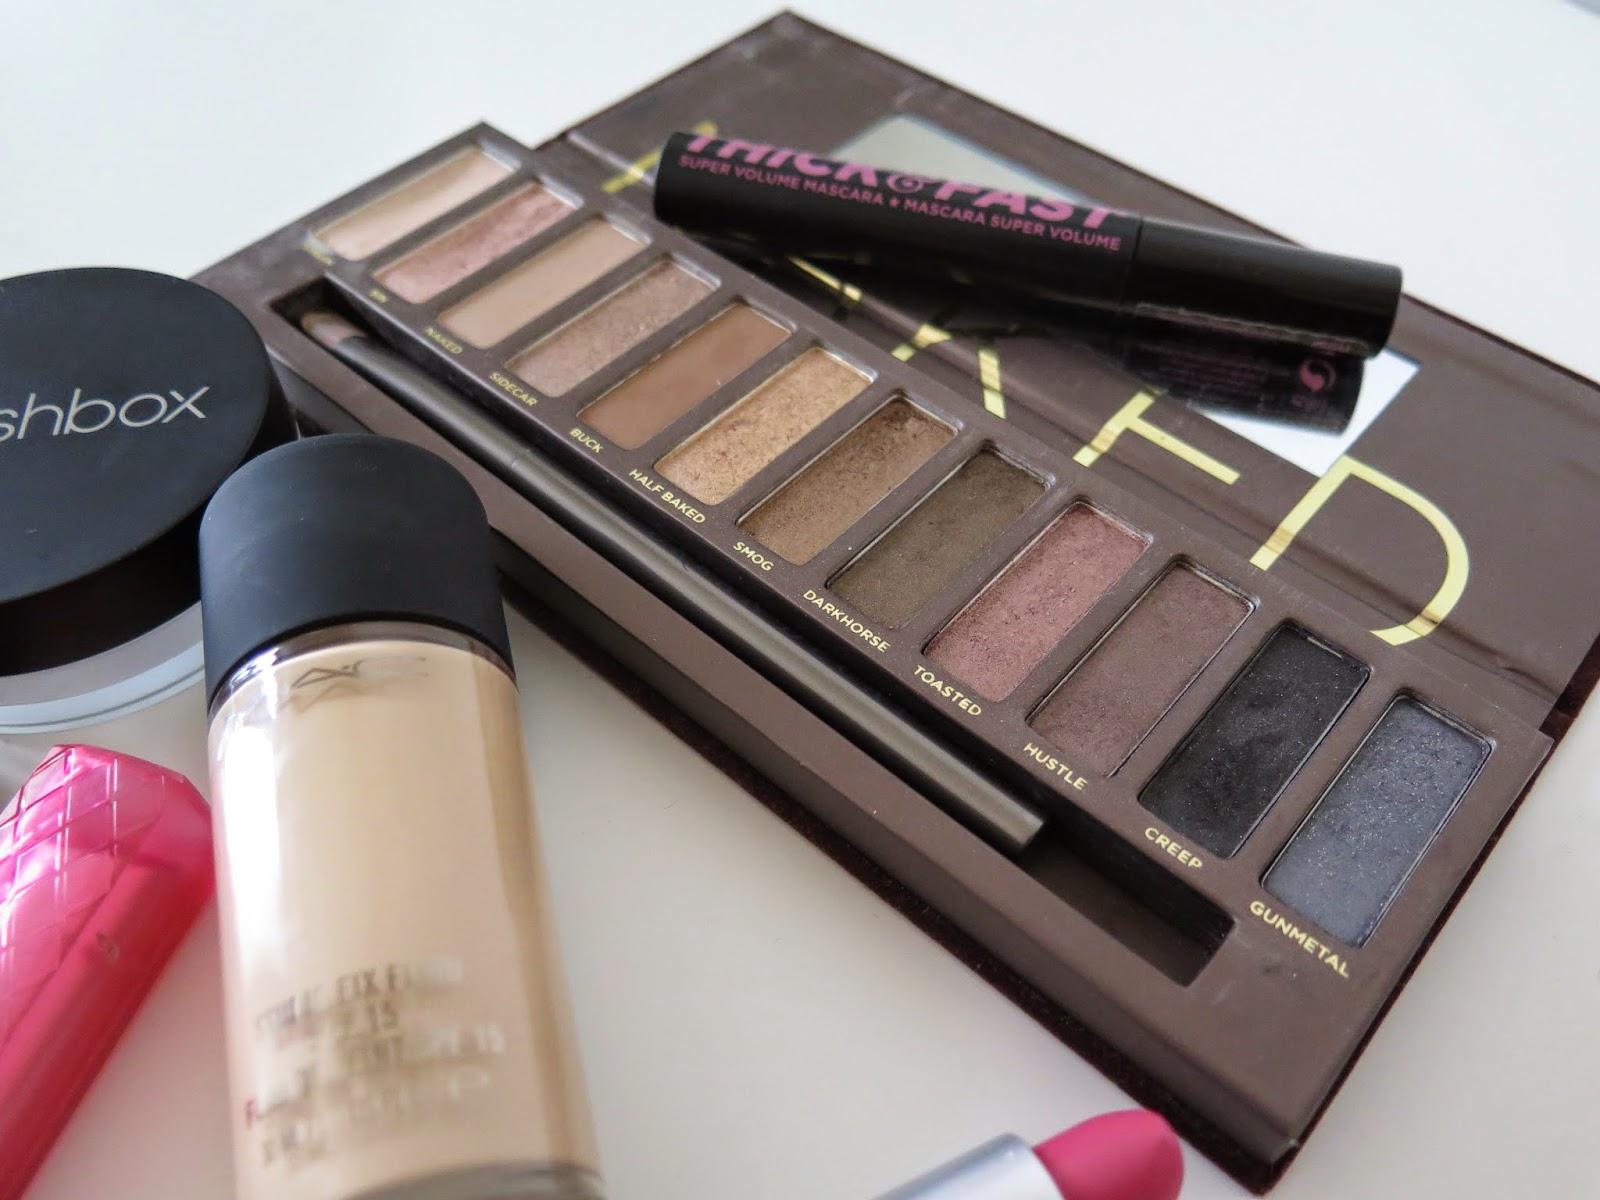 make-up, urban decay, MAC